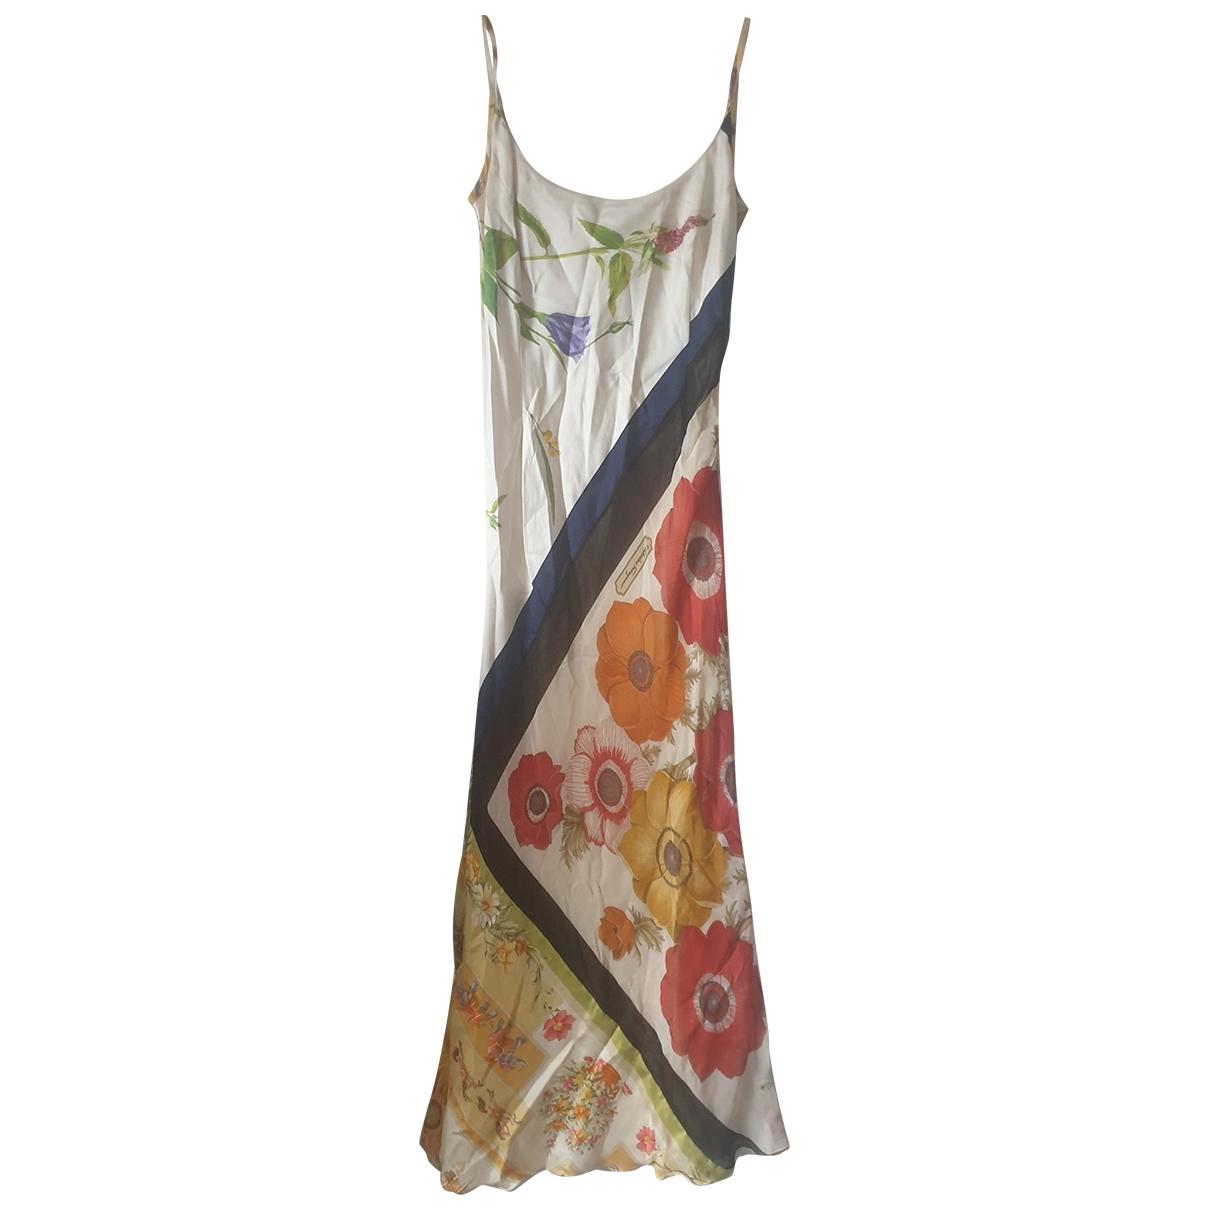 Salvatore Ferragamo - Robe   pour femme en soie - multicolore